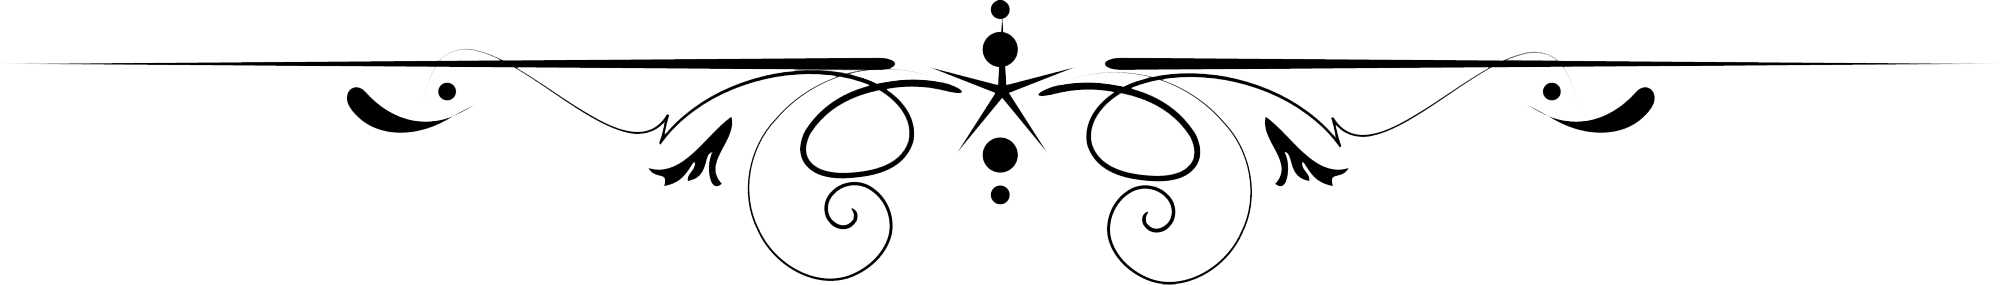 Decorative Line Black PNG Transparent Images.